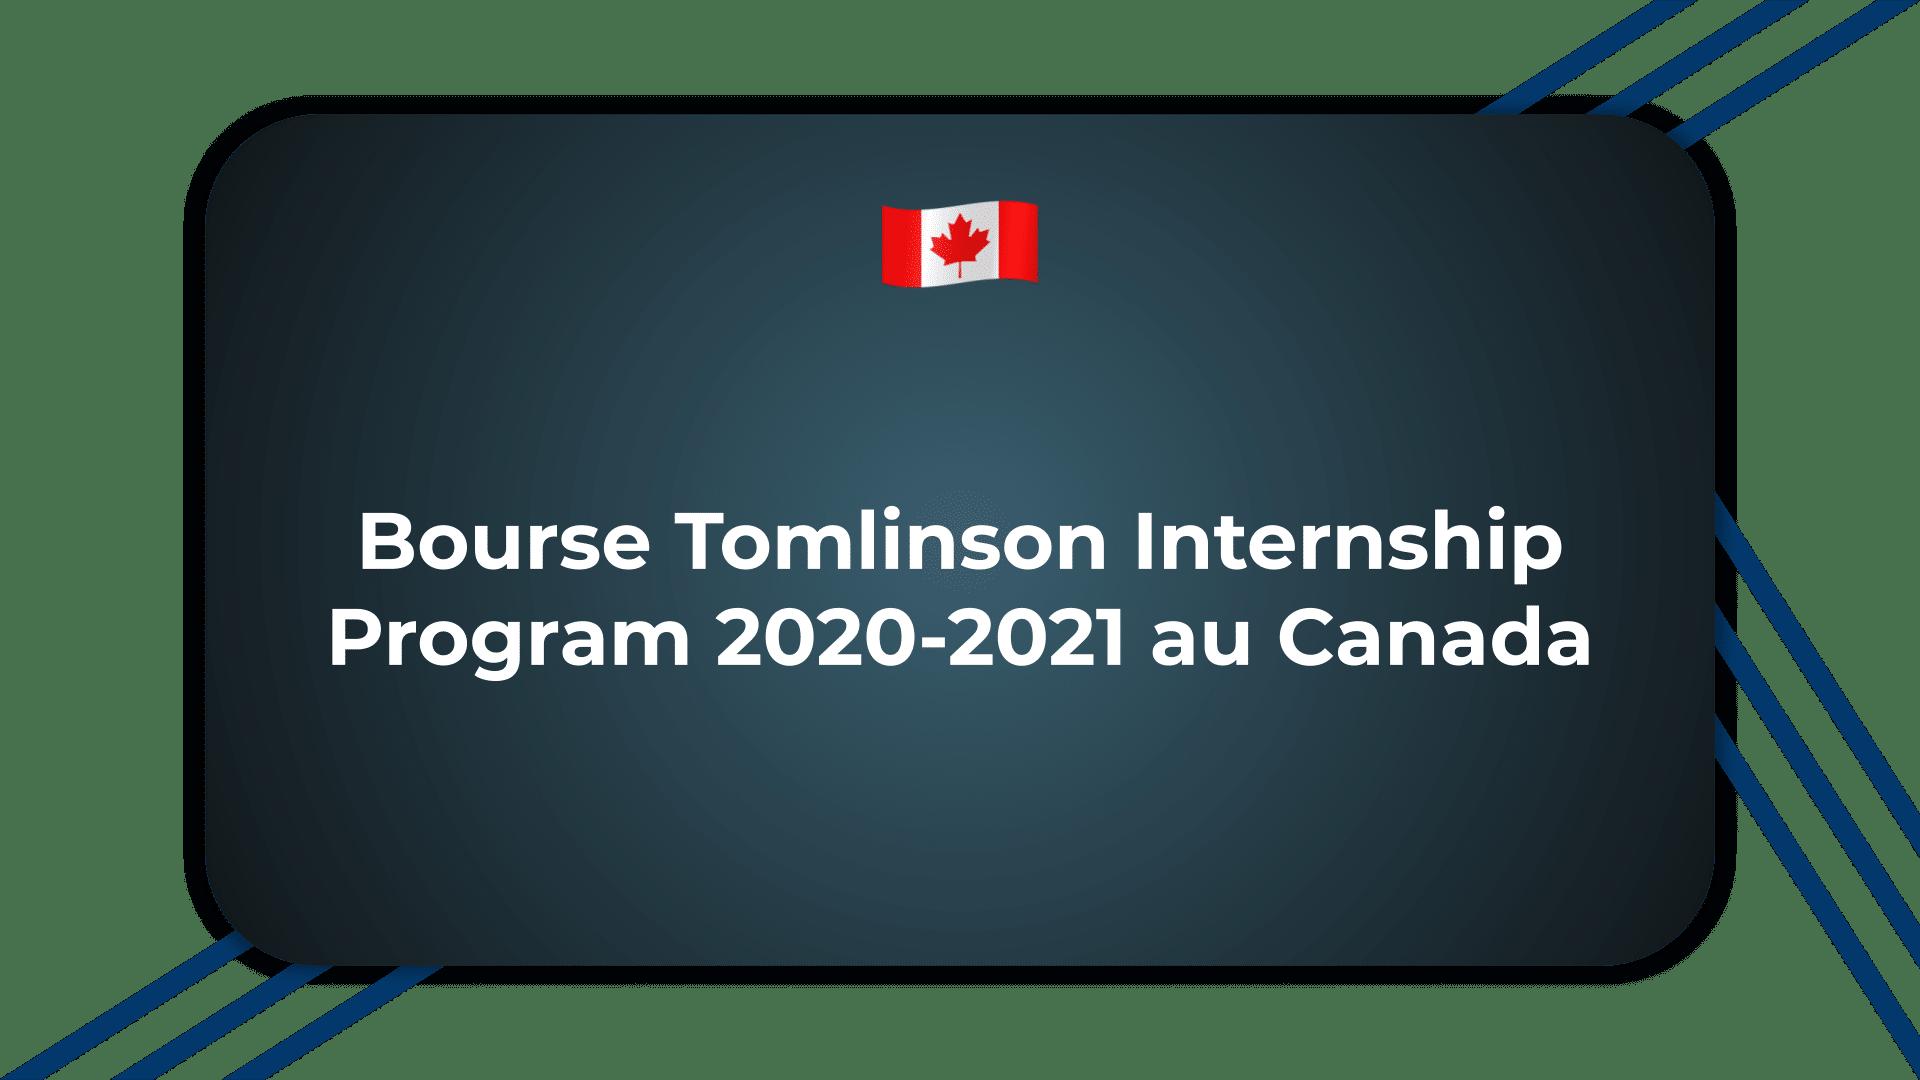 Bourse Tomlinson Internship Program